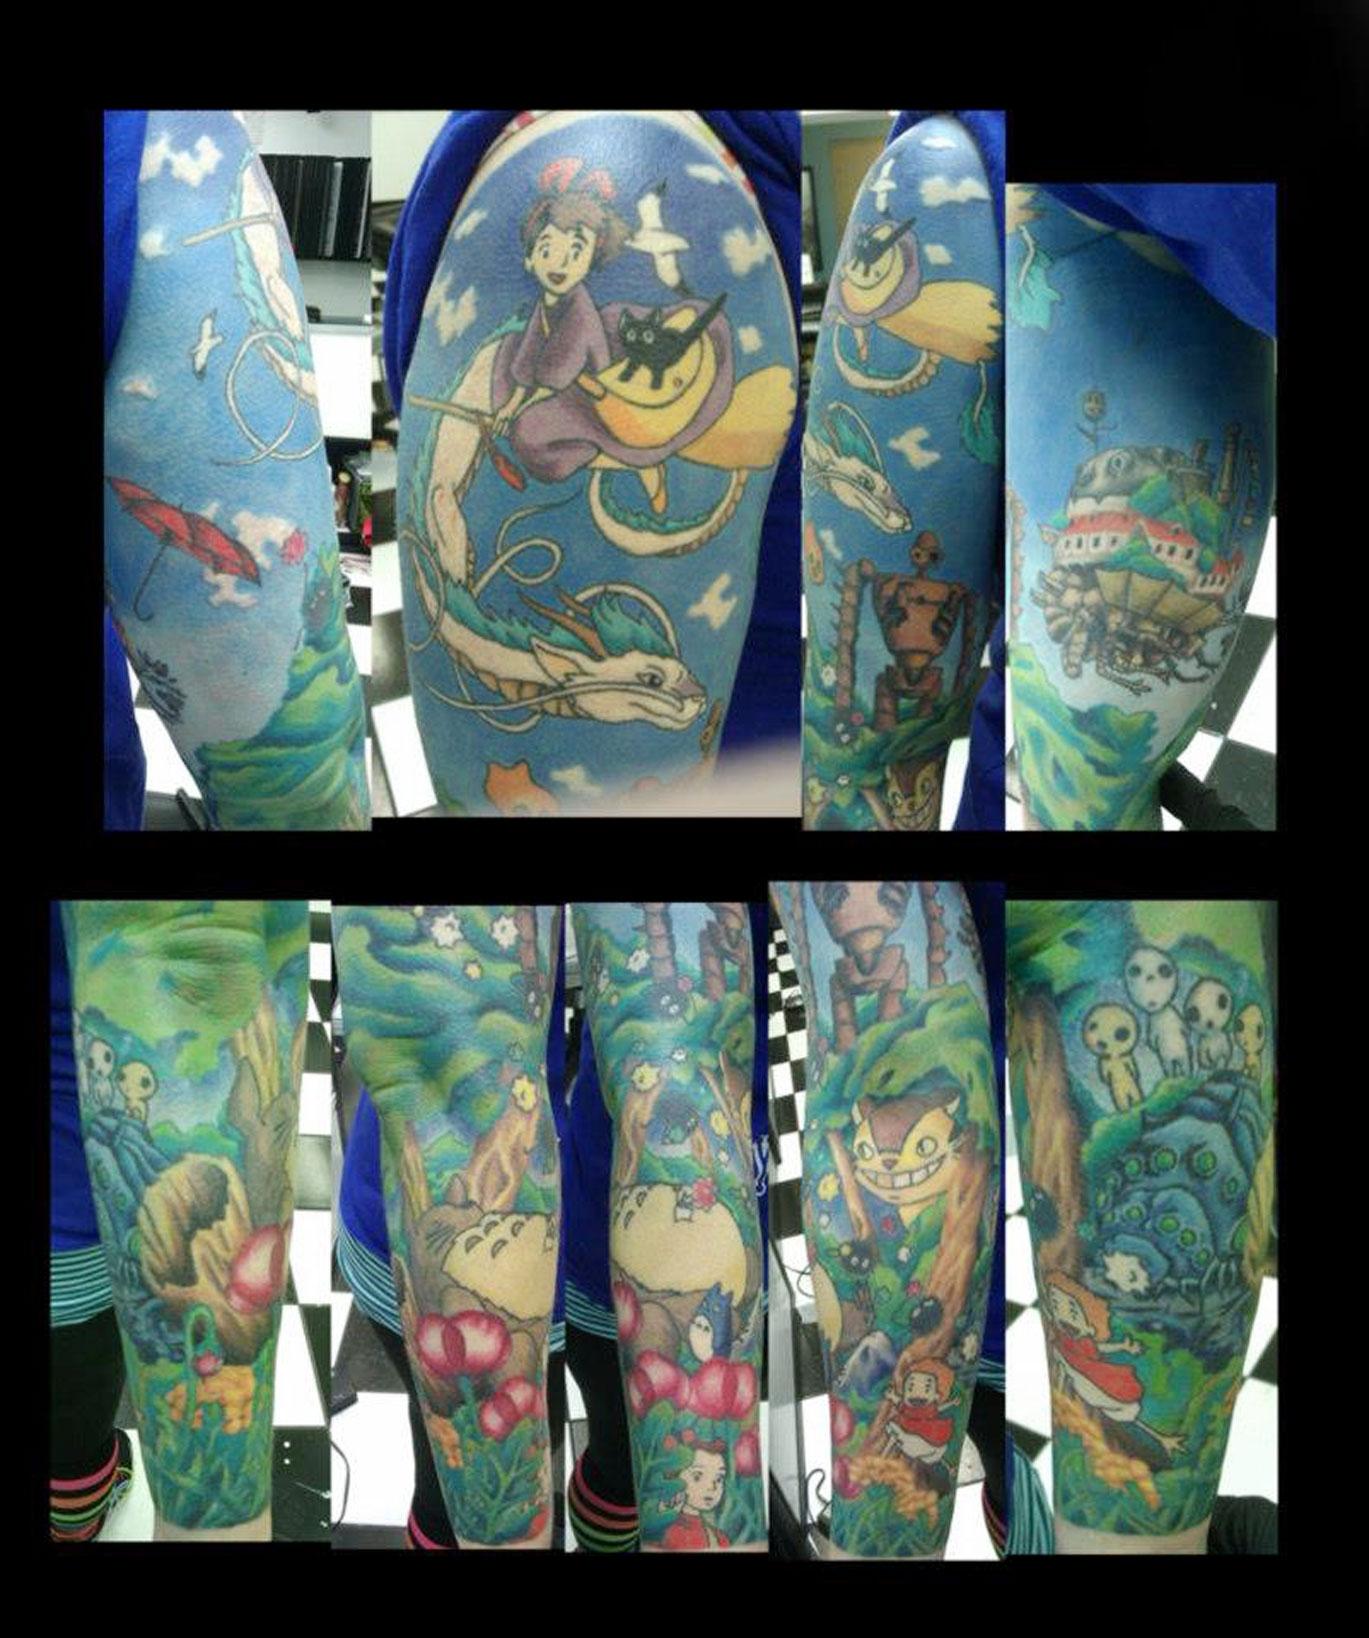 Full Anime Sleeve Tattoo Idea